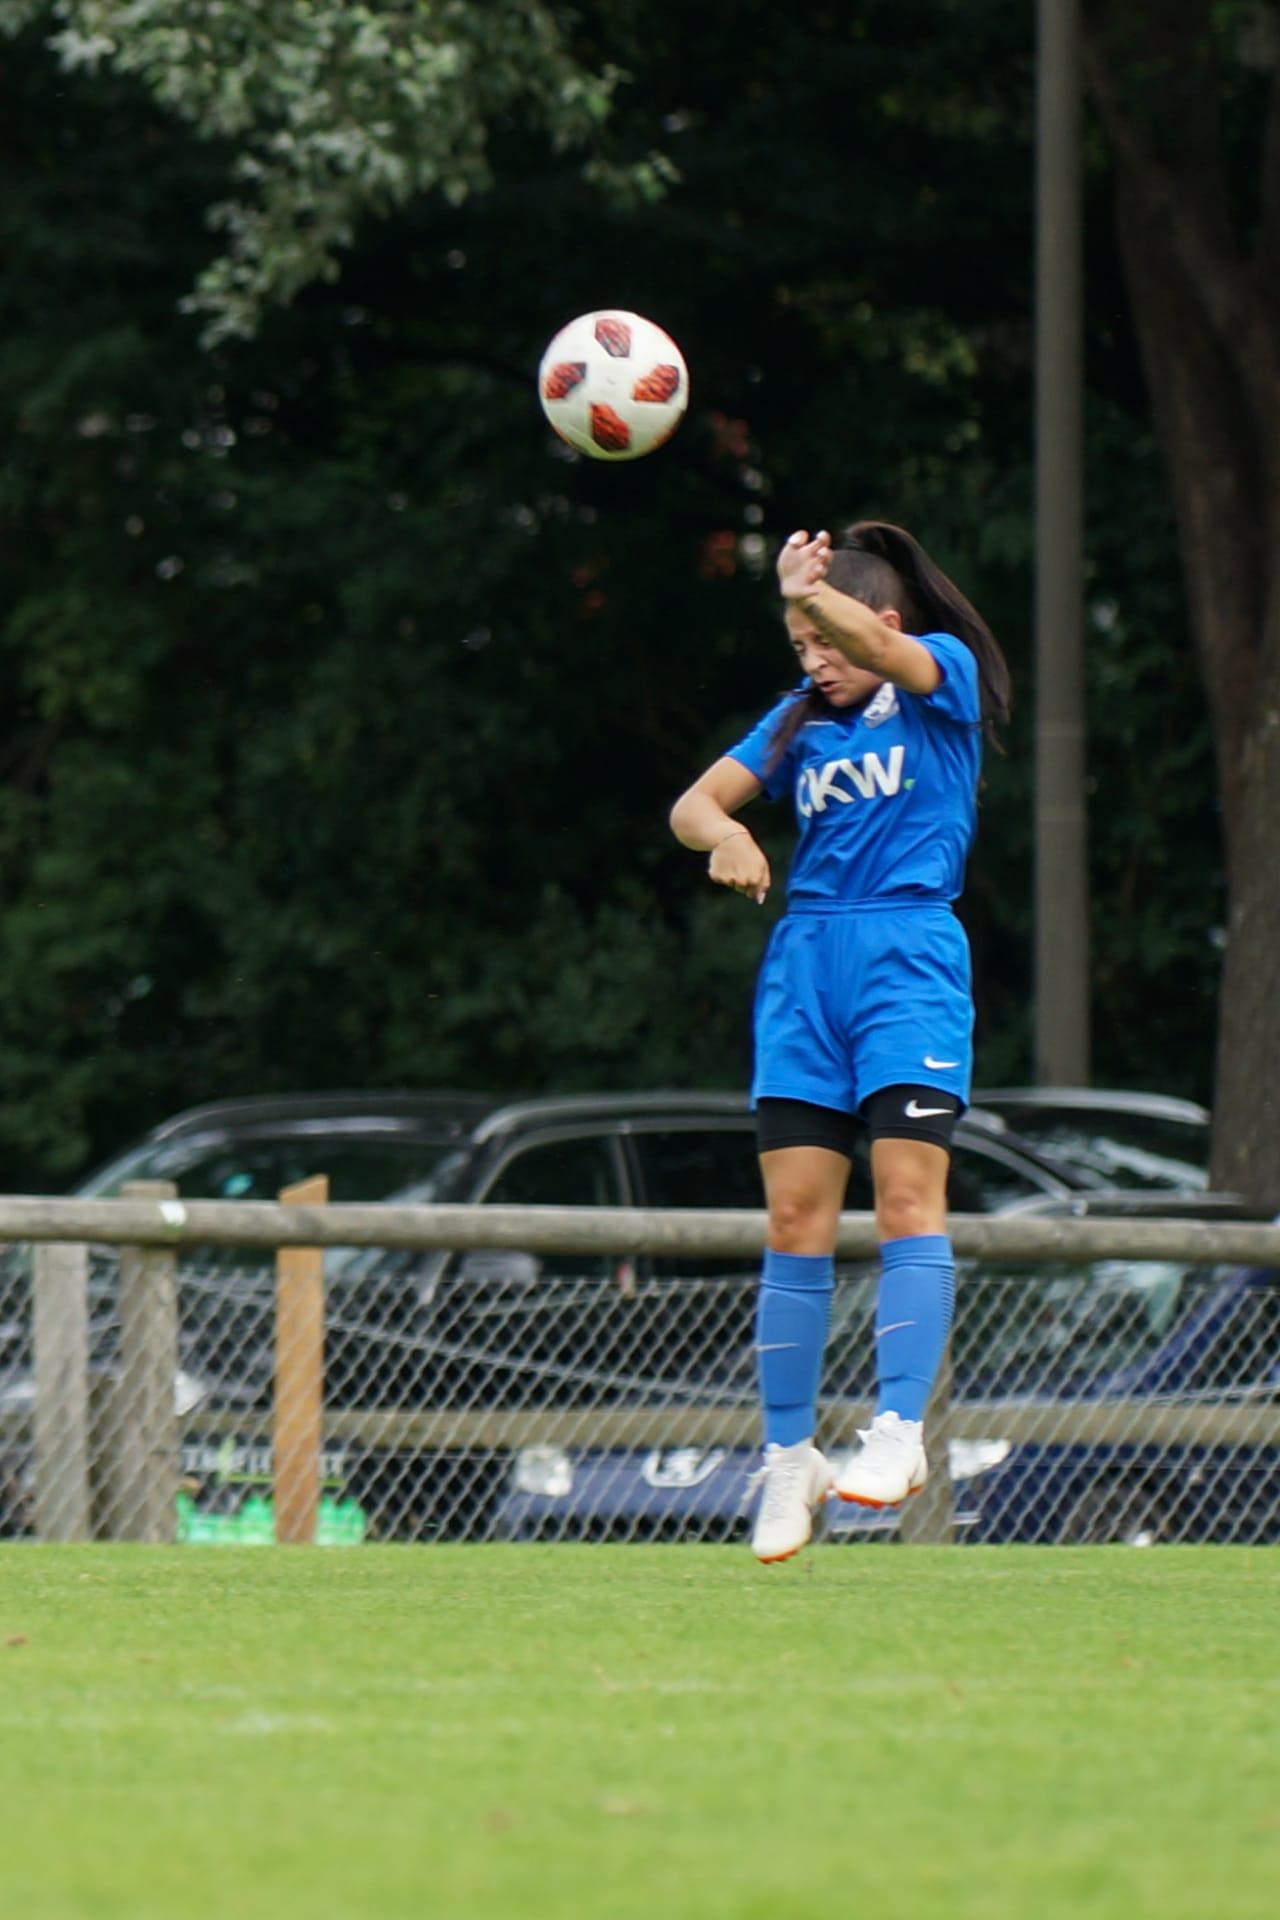 U17: TS FCL-Emmen 17-08-2019